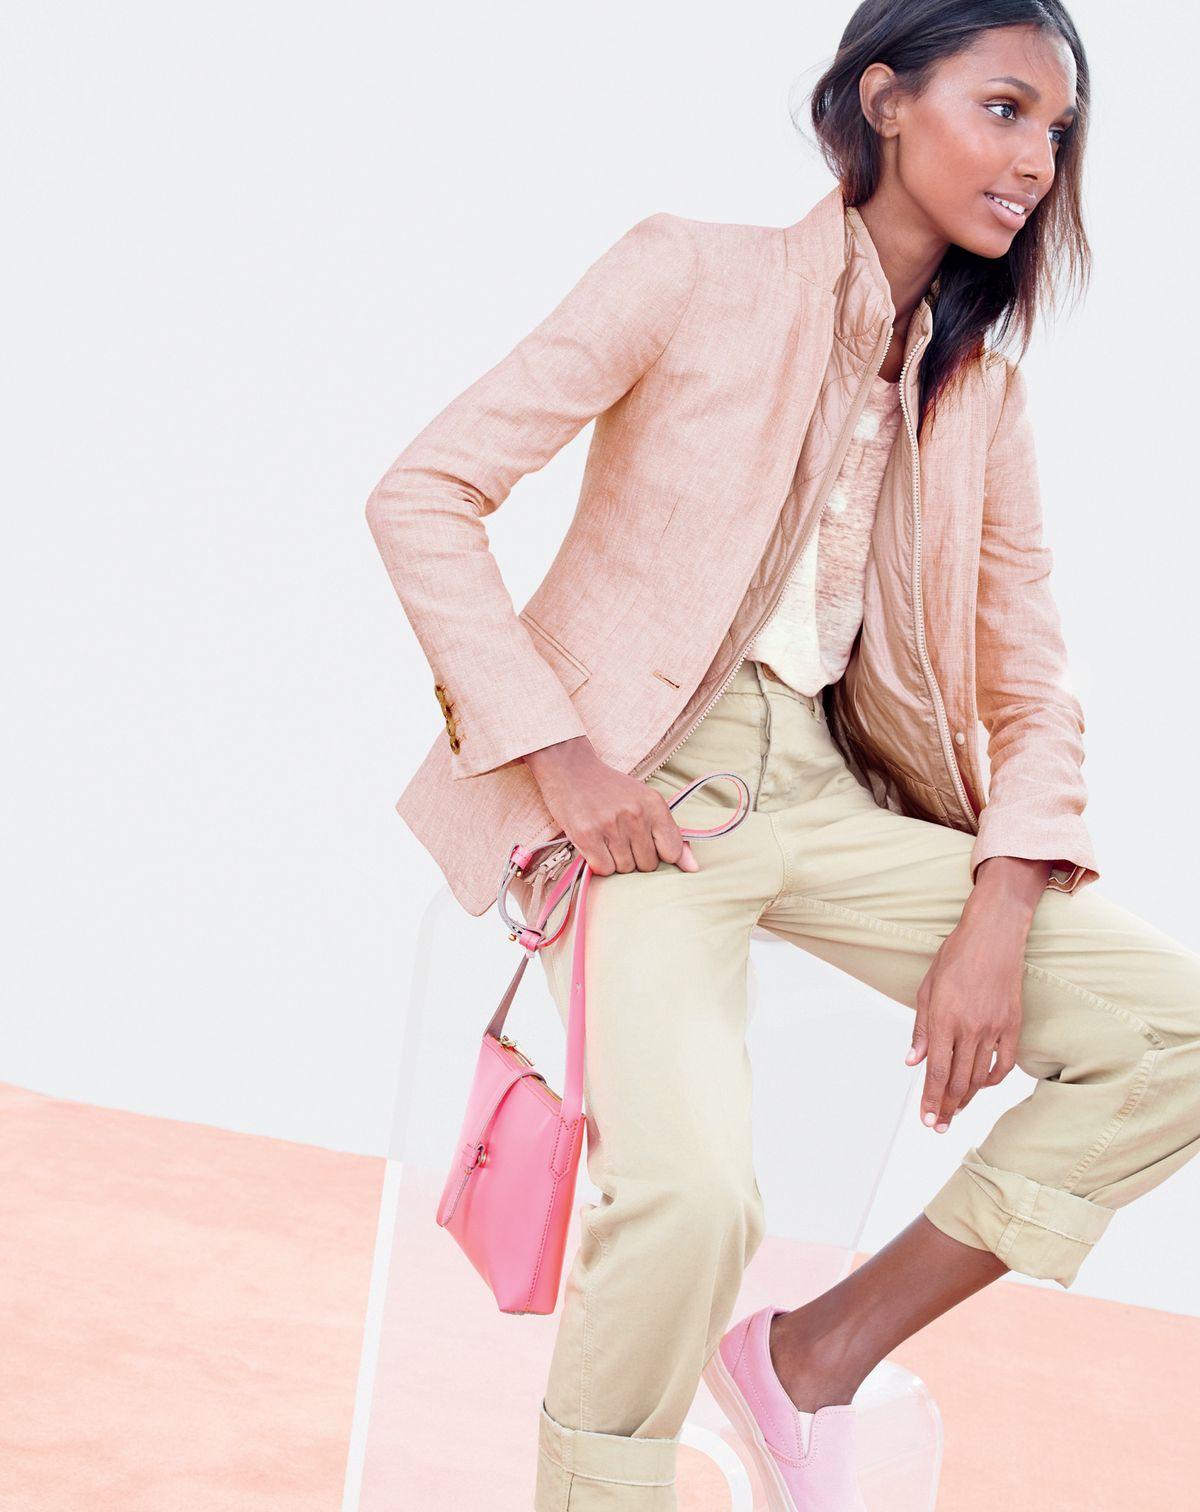 MAR '15 Style Guide: J.Crew women's Regent blazer in linen and Parker crossbody bag in neon flame.